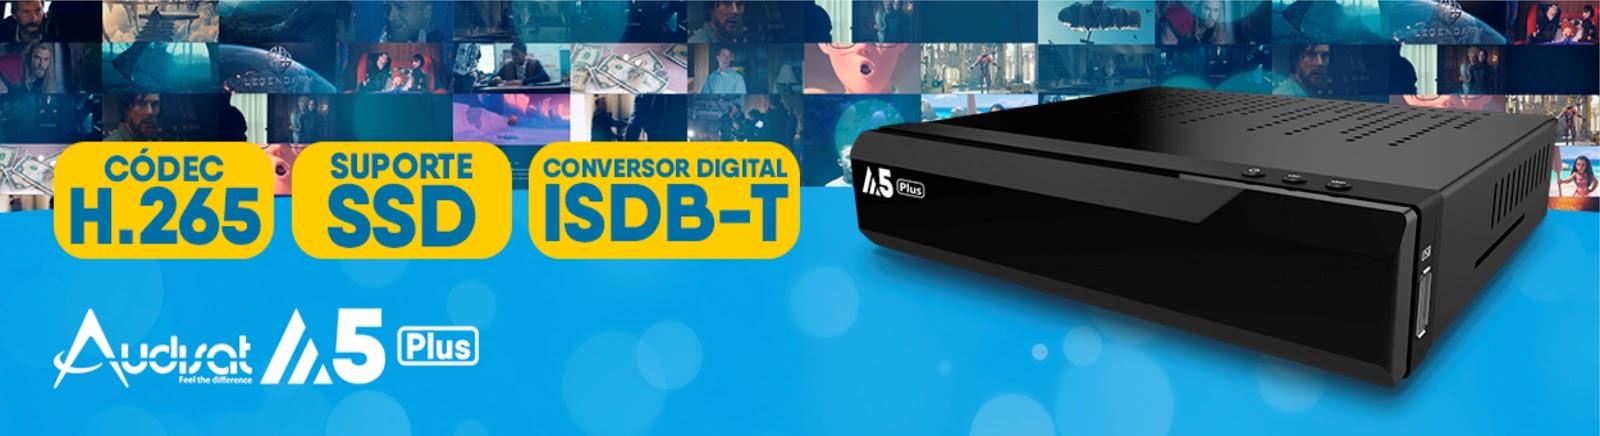 Audisat A5